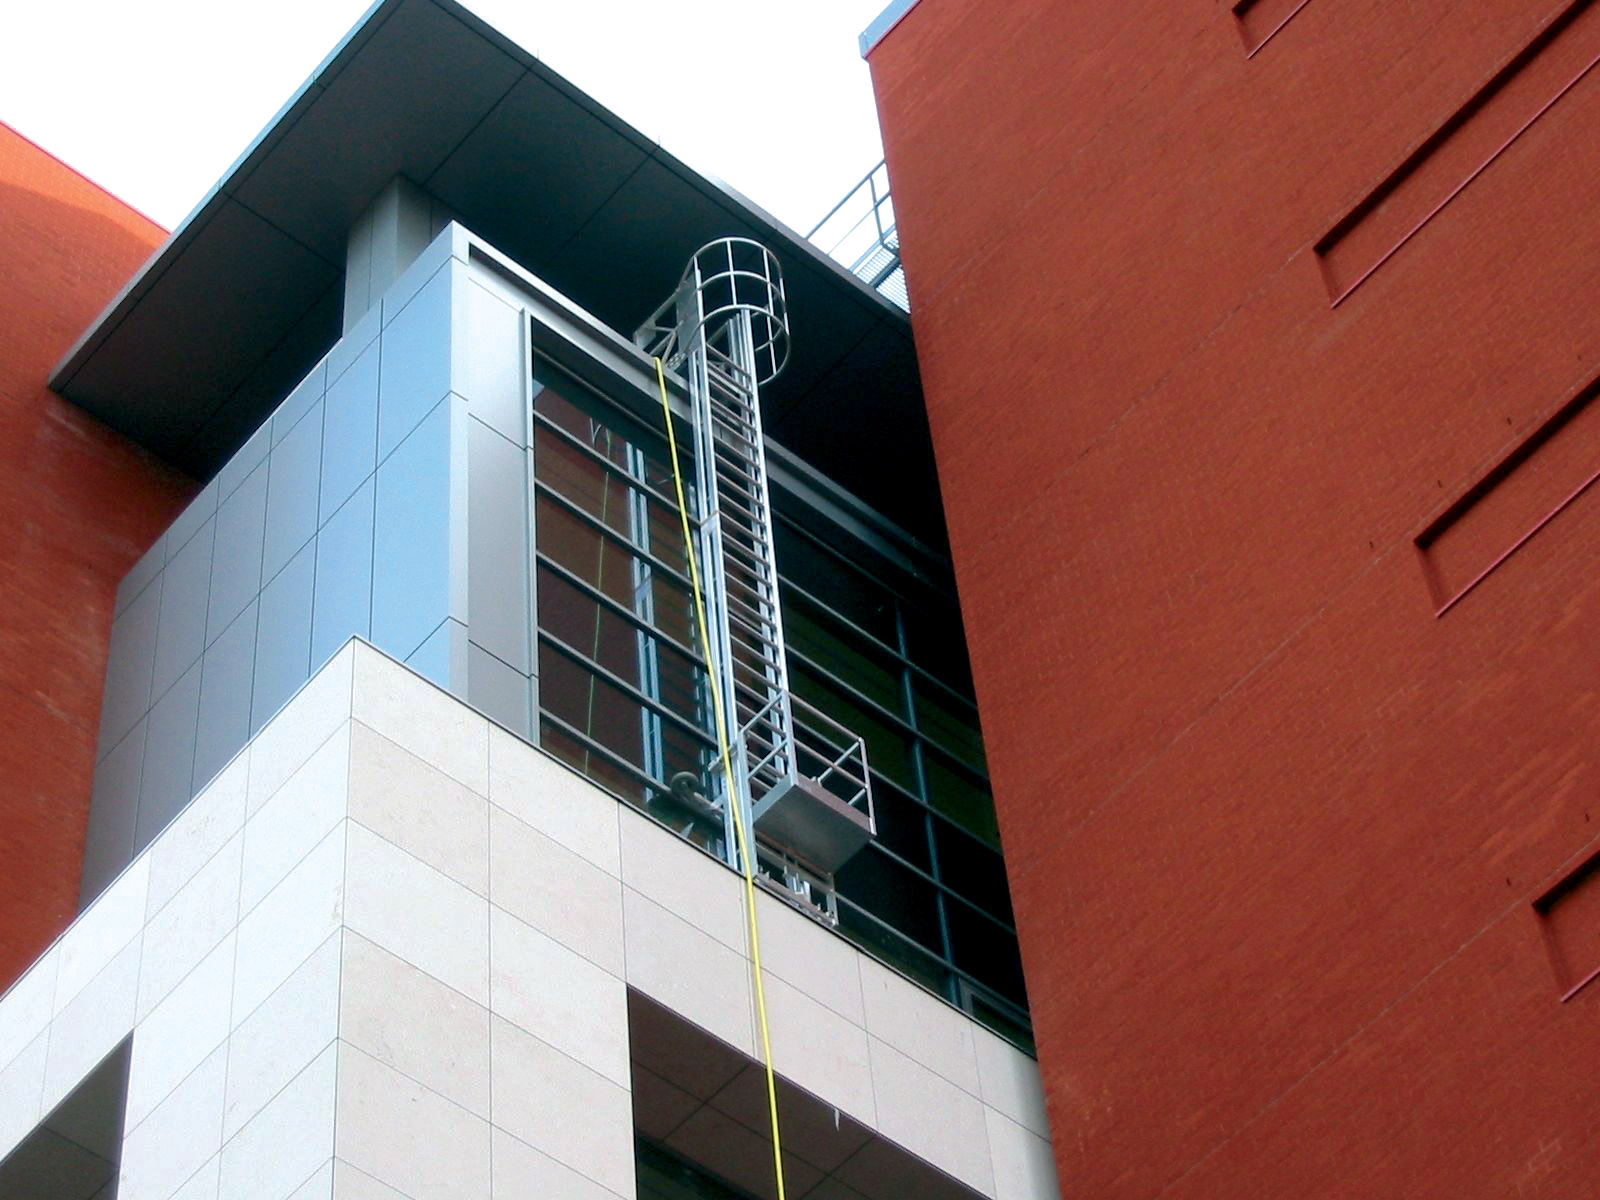 Jomy Mobile Vertical Ladder With Washlift